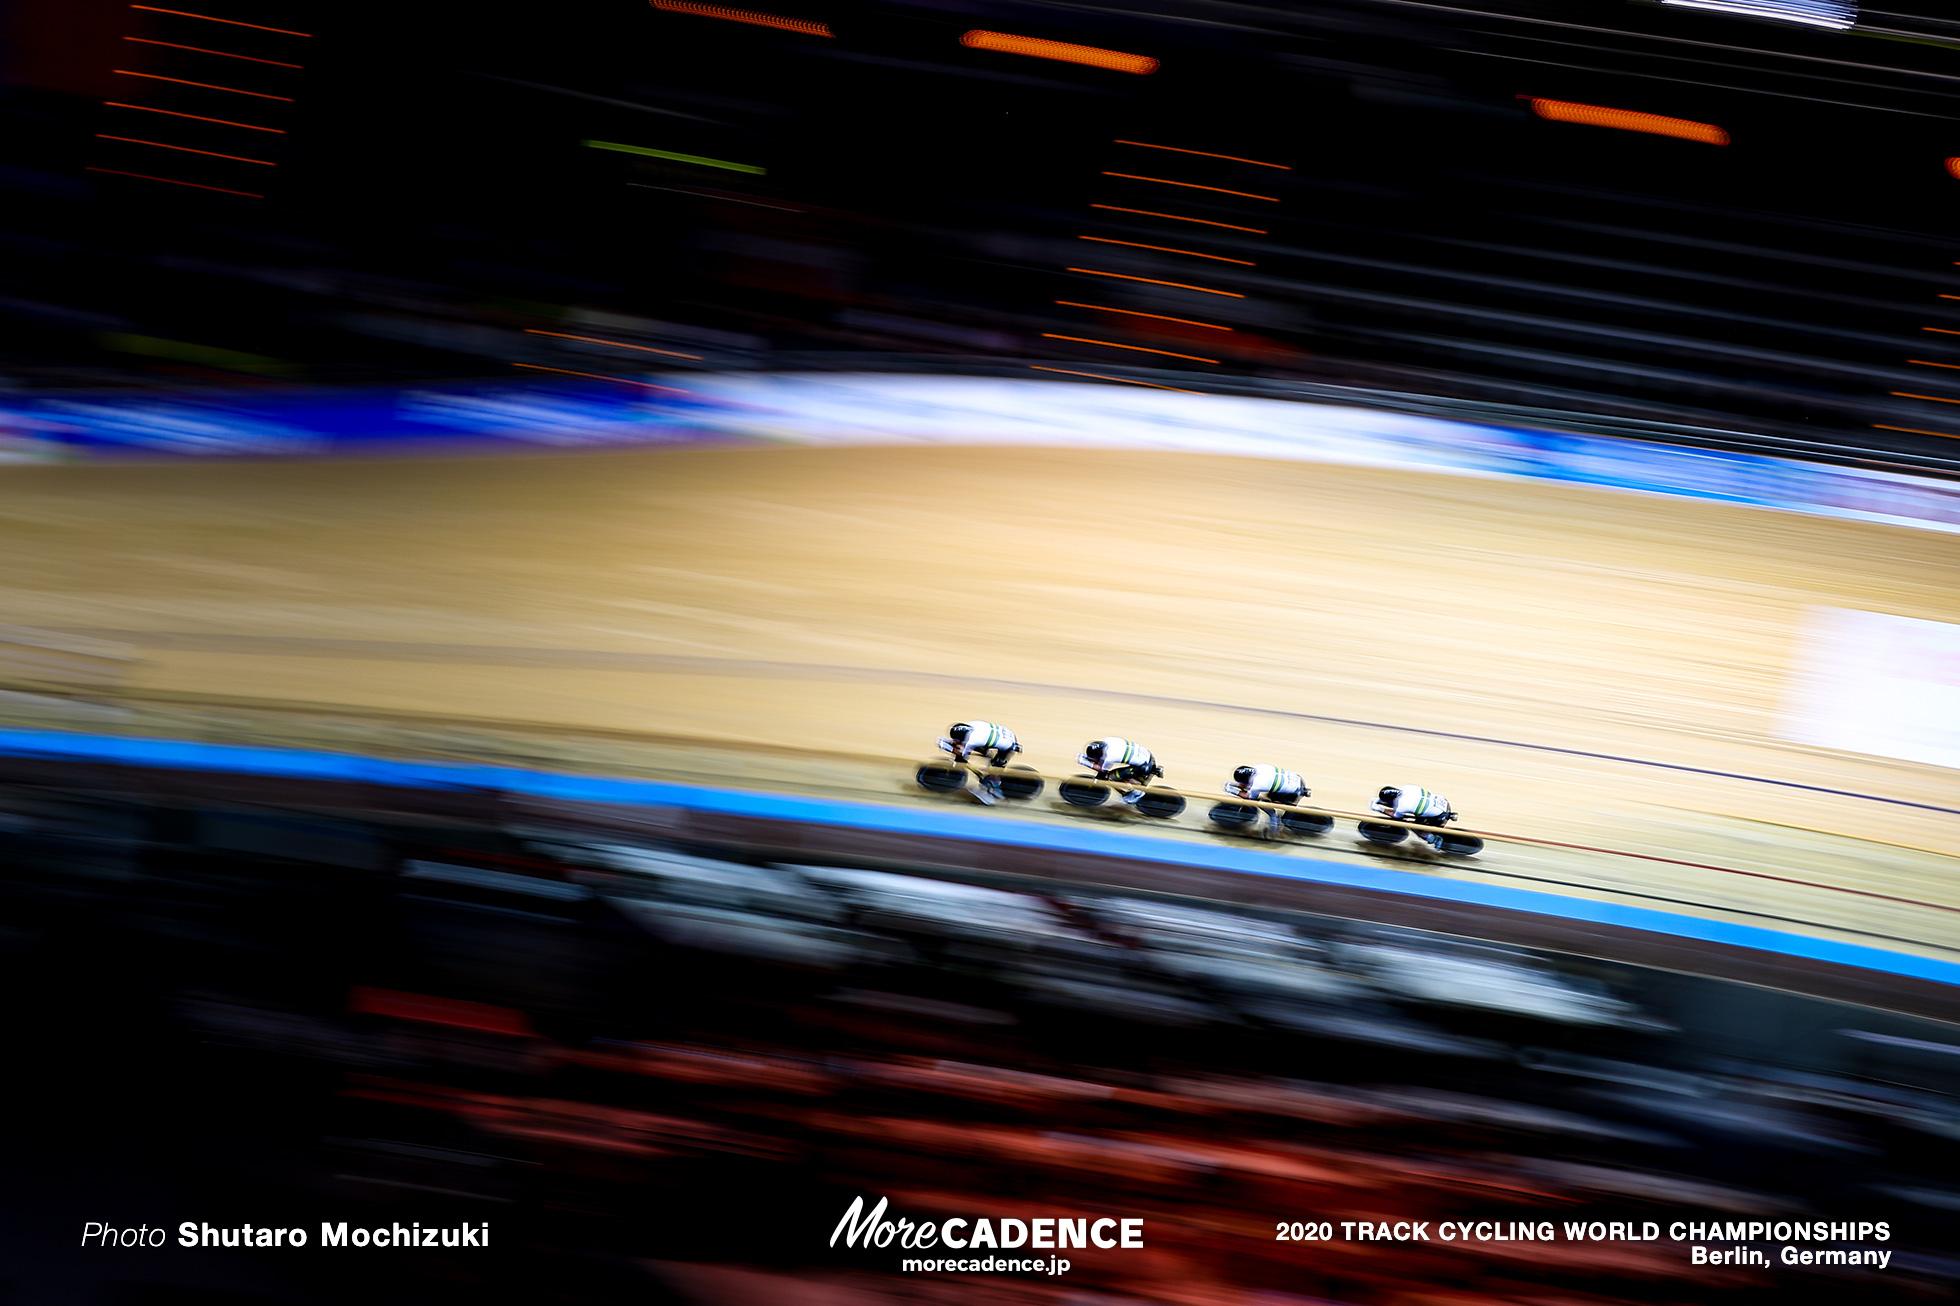 Final / Men's Team Pursuit / 2020 Track Cycling World Championships / Australia オーストラリア/ Leihg Howard レイ・ハワード, Lucas Plapp ルーカス・プラップ, Alexander Porter アレクサンダー・ポーター, Sam Welsford サム・ウェルスフォード